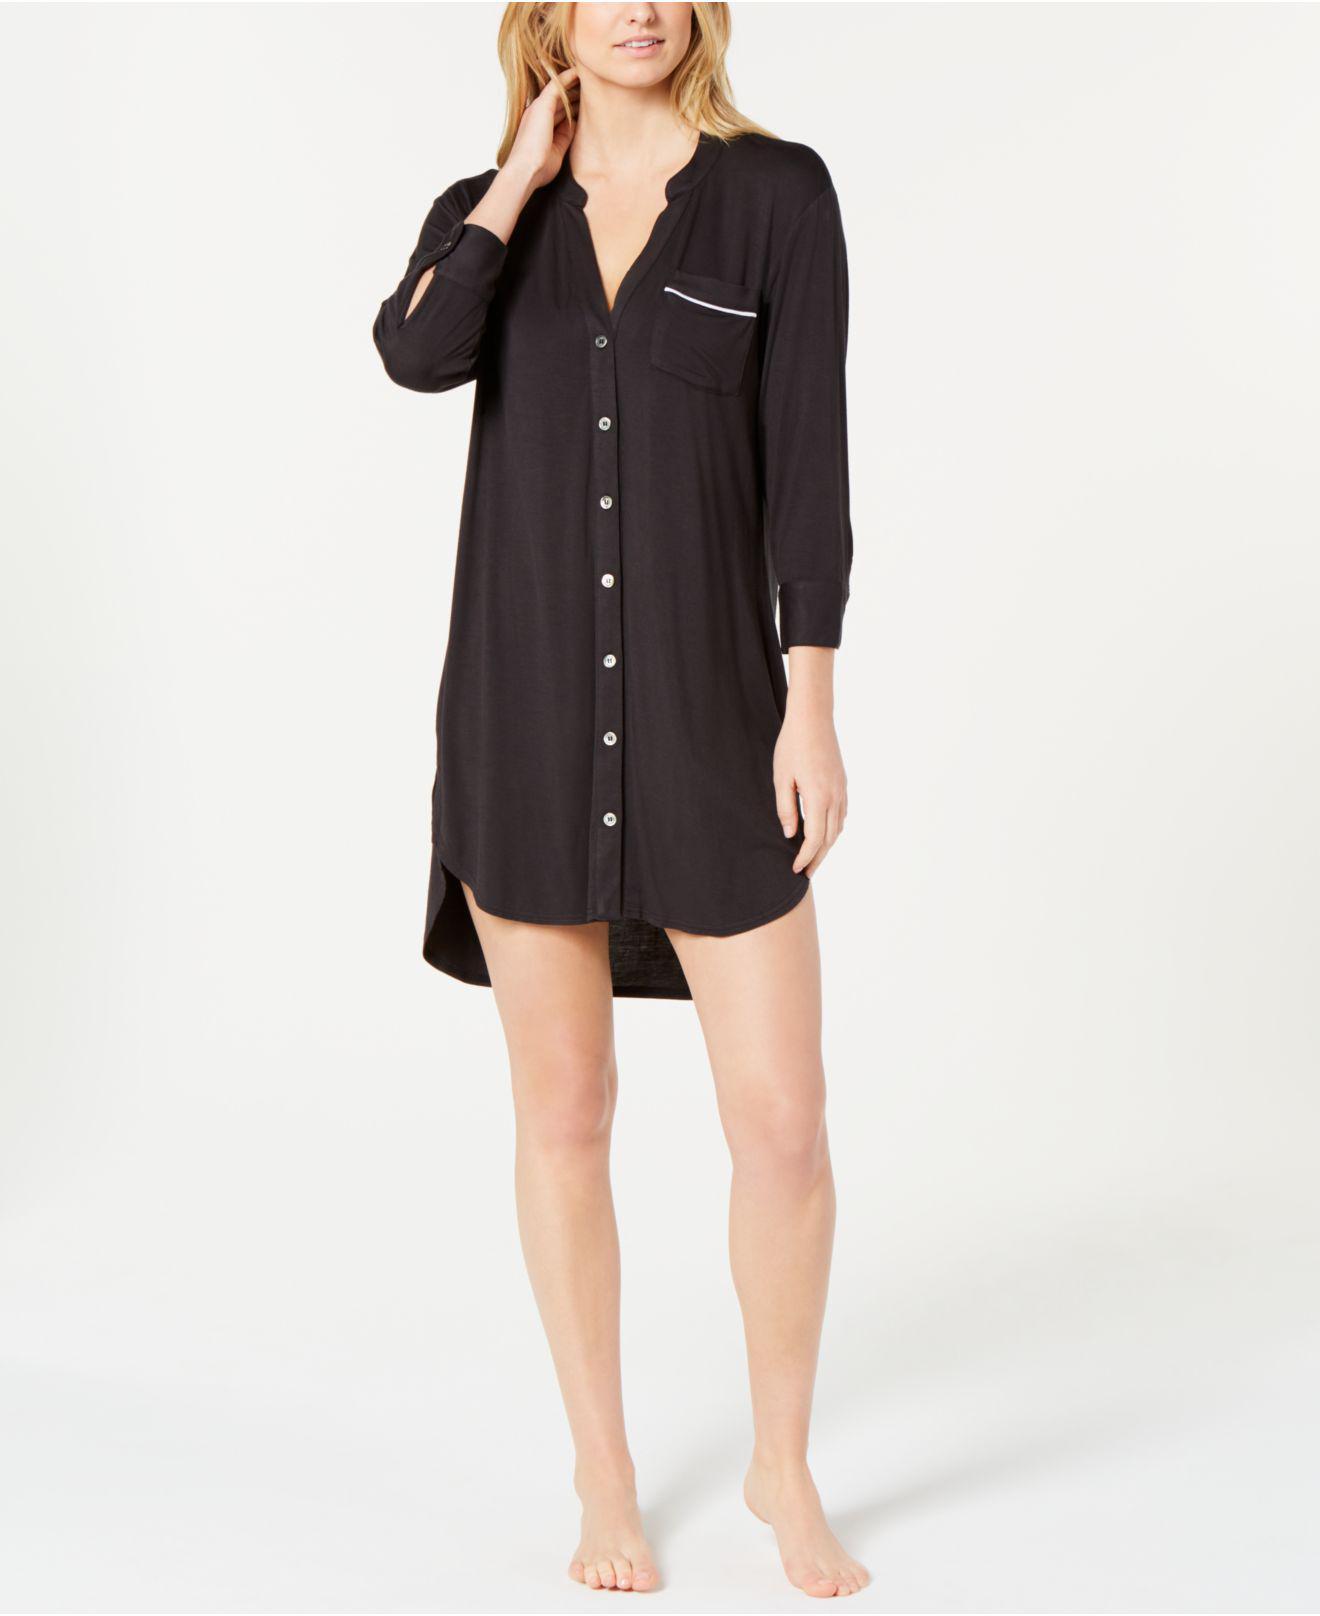 2a9080cb75 Lyst - Ugg Vivian Knit Sleepshirt in Black